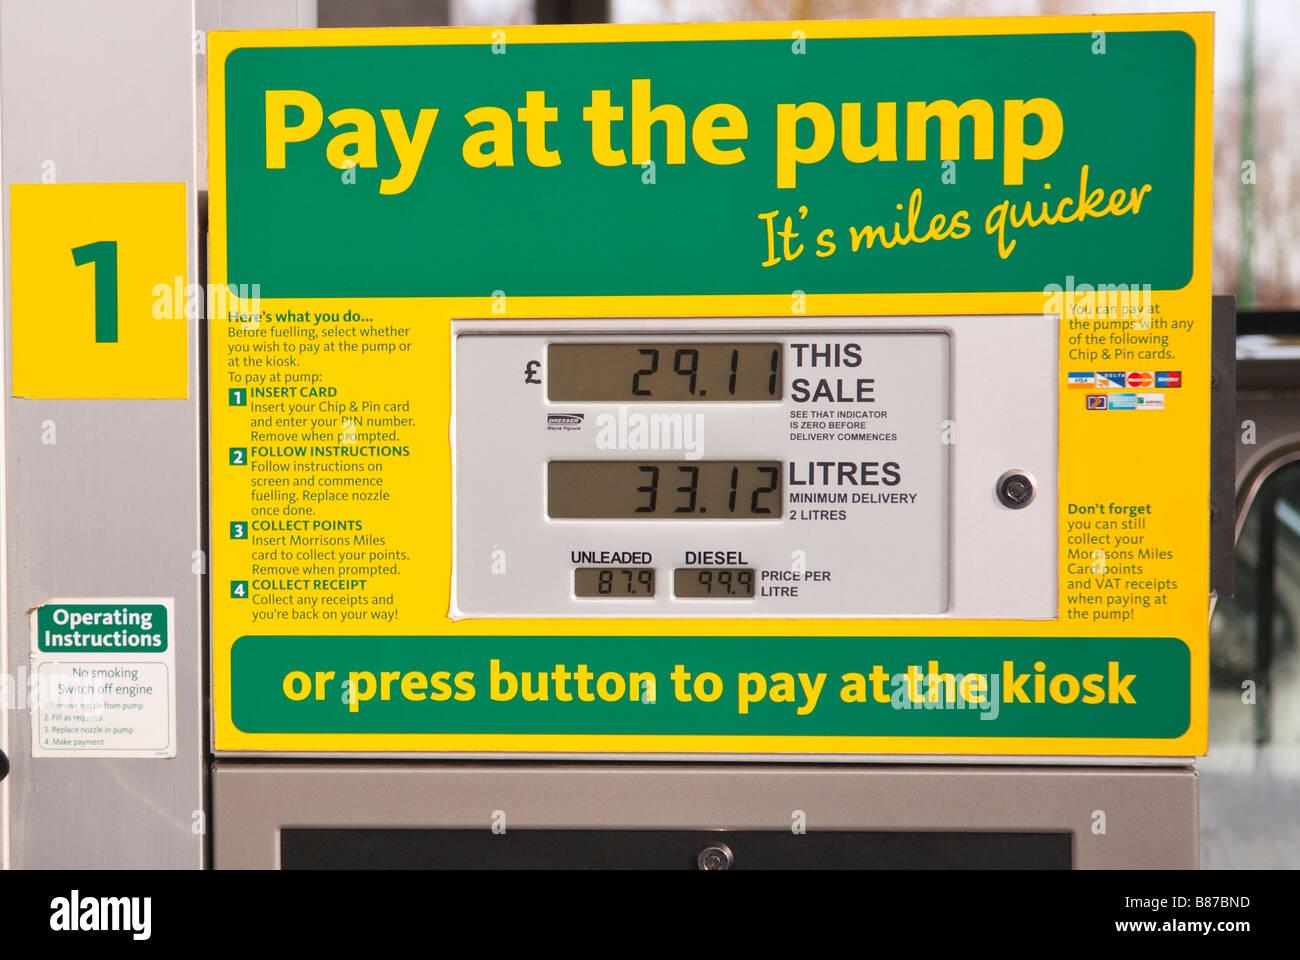 Morrisons Petrol Pump Stock Photos & Morrisons Petrol Pump Stock ...